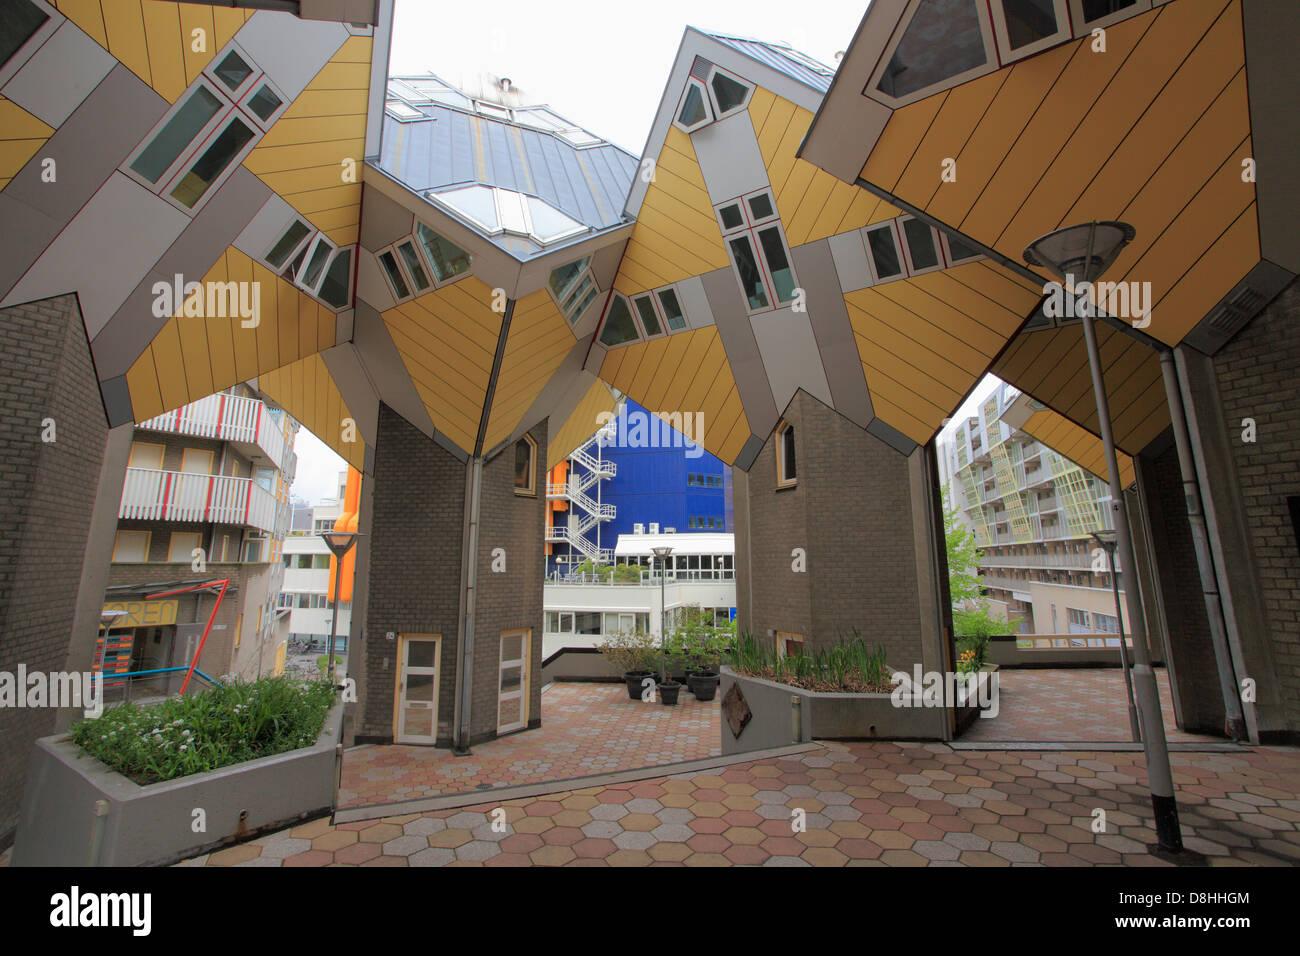 Países Bajos, Rotterdam, Kubus, cube apartamentos, Imagen De Stock